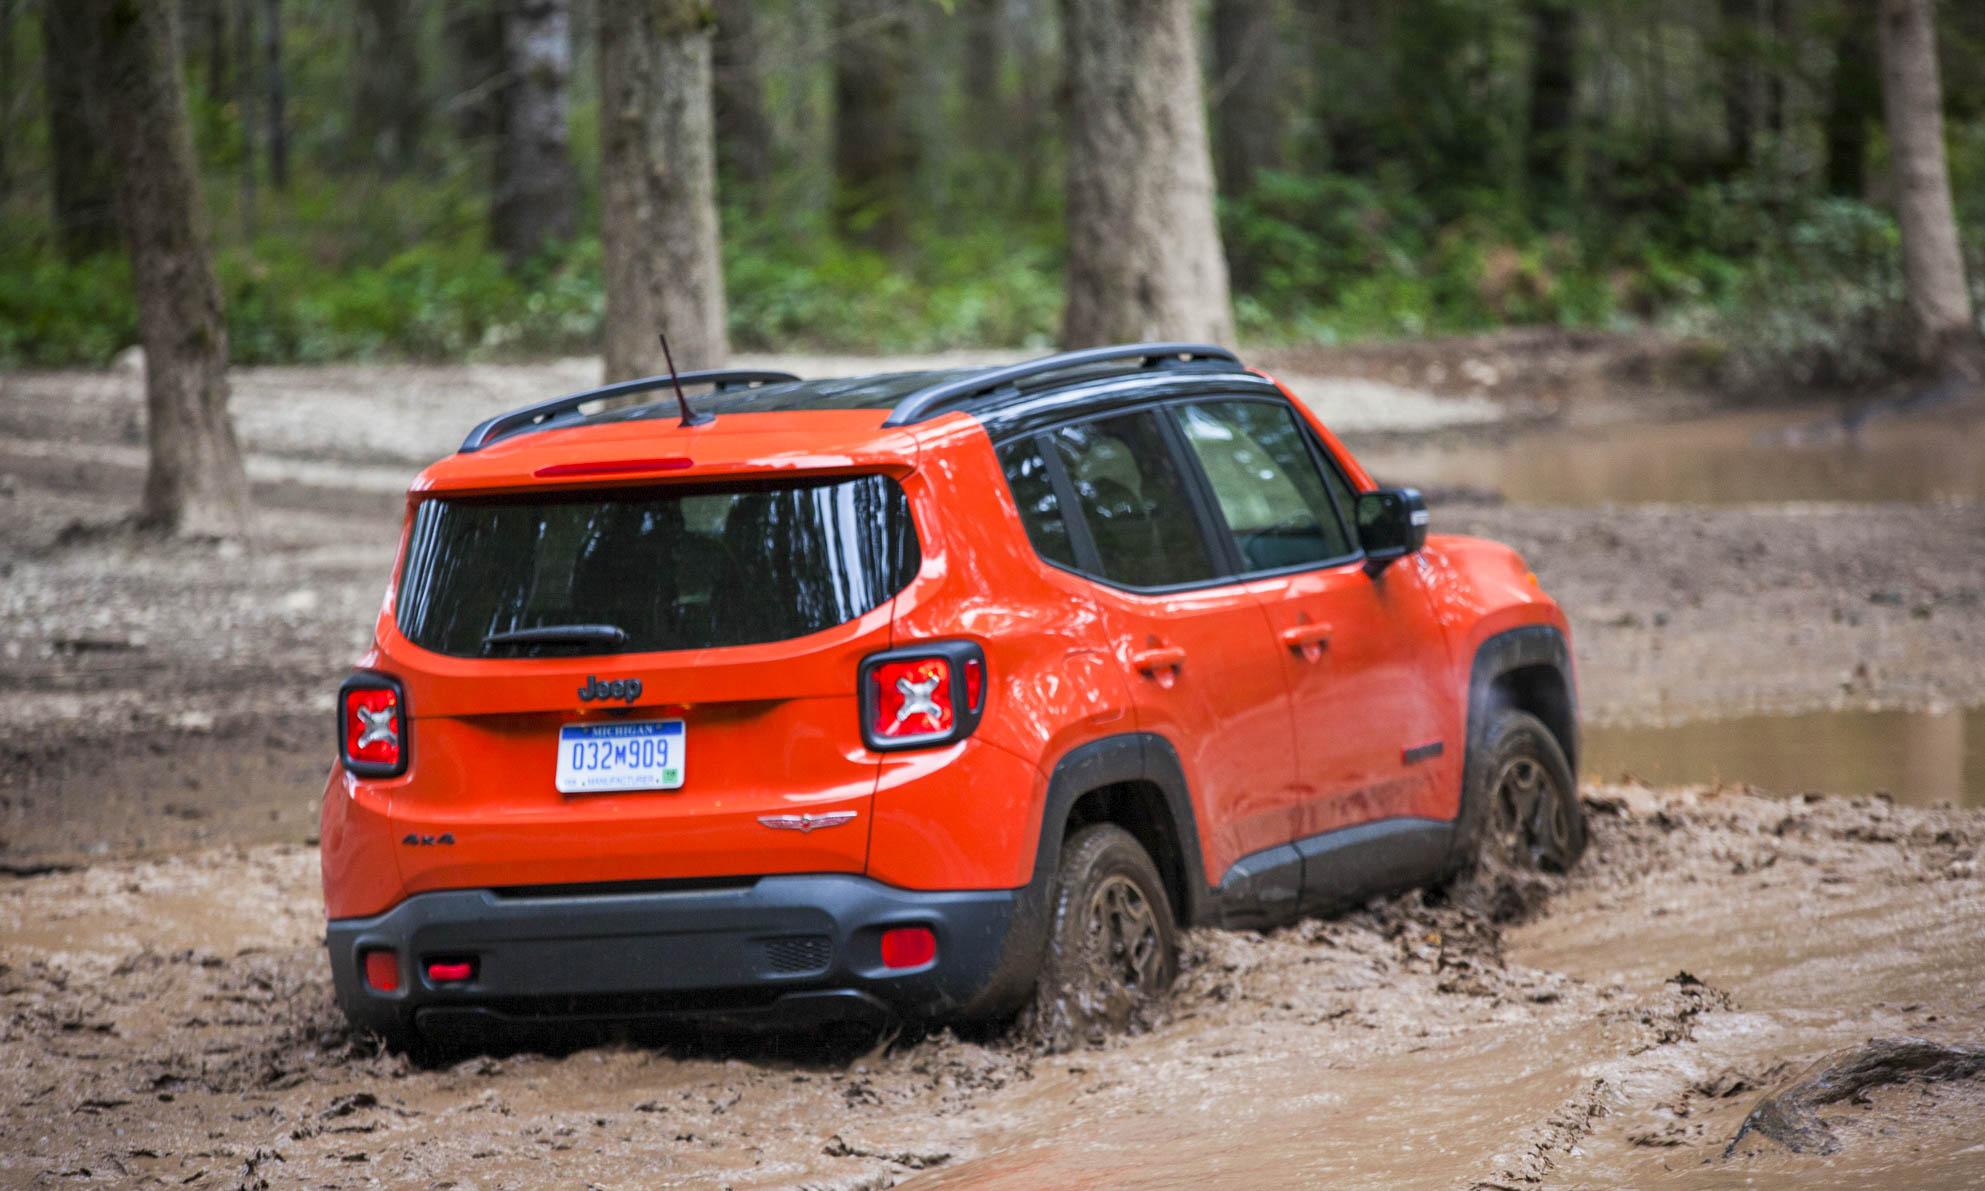 © Northwest Automotive Press Association